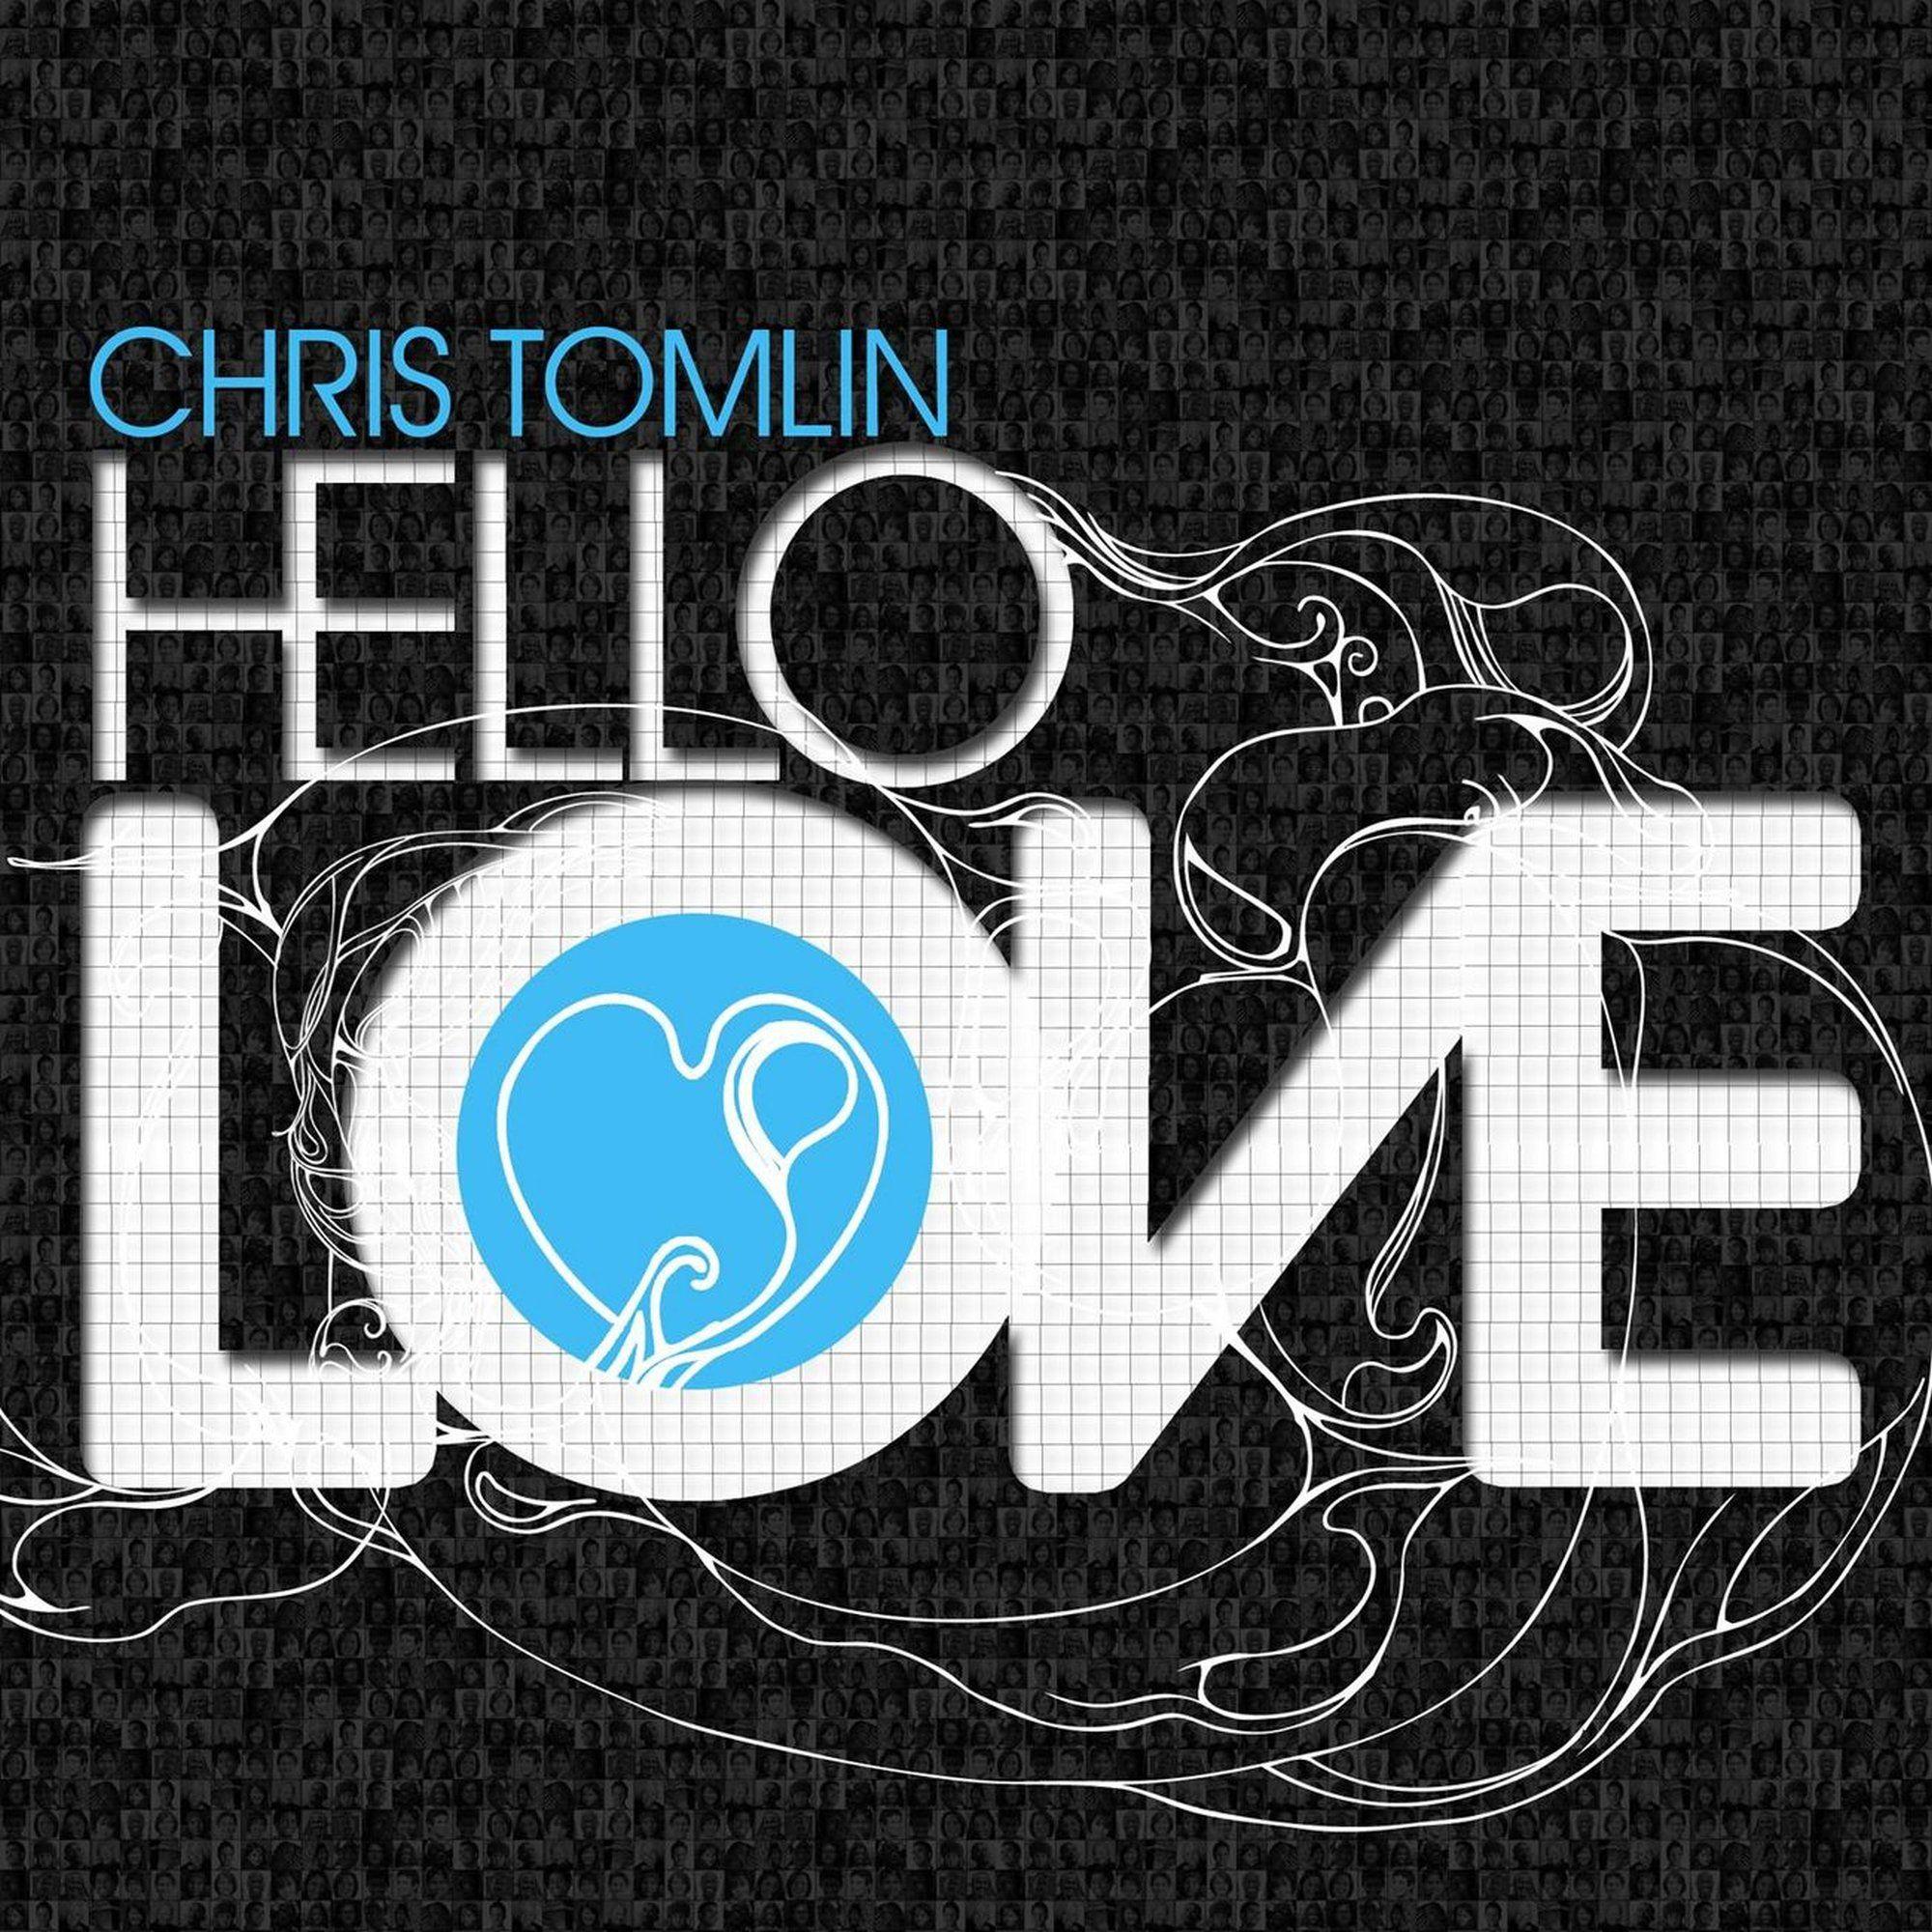 Chris Tomlin - Hello Love album cover